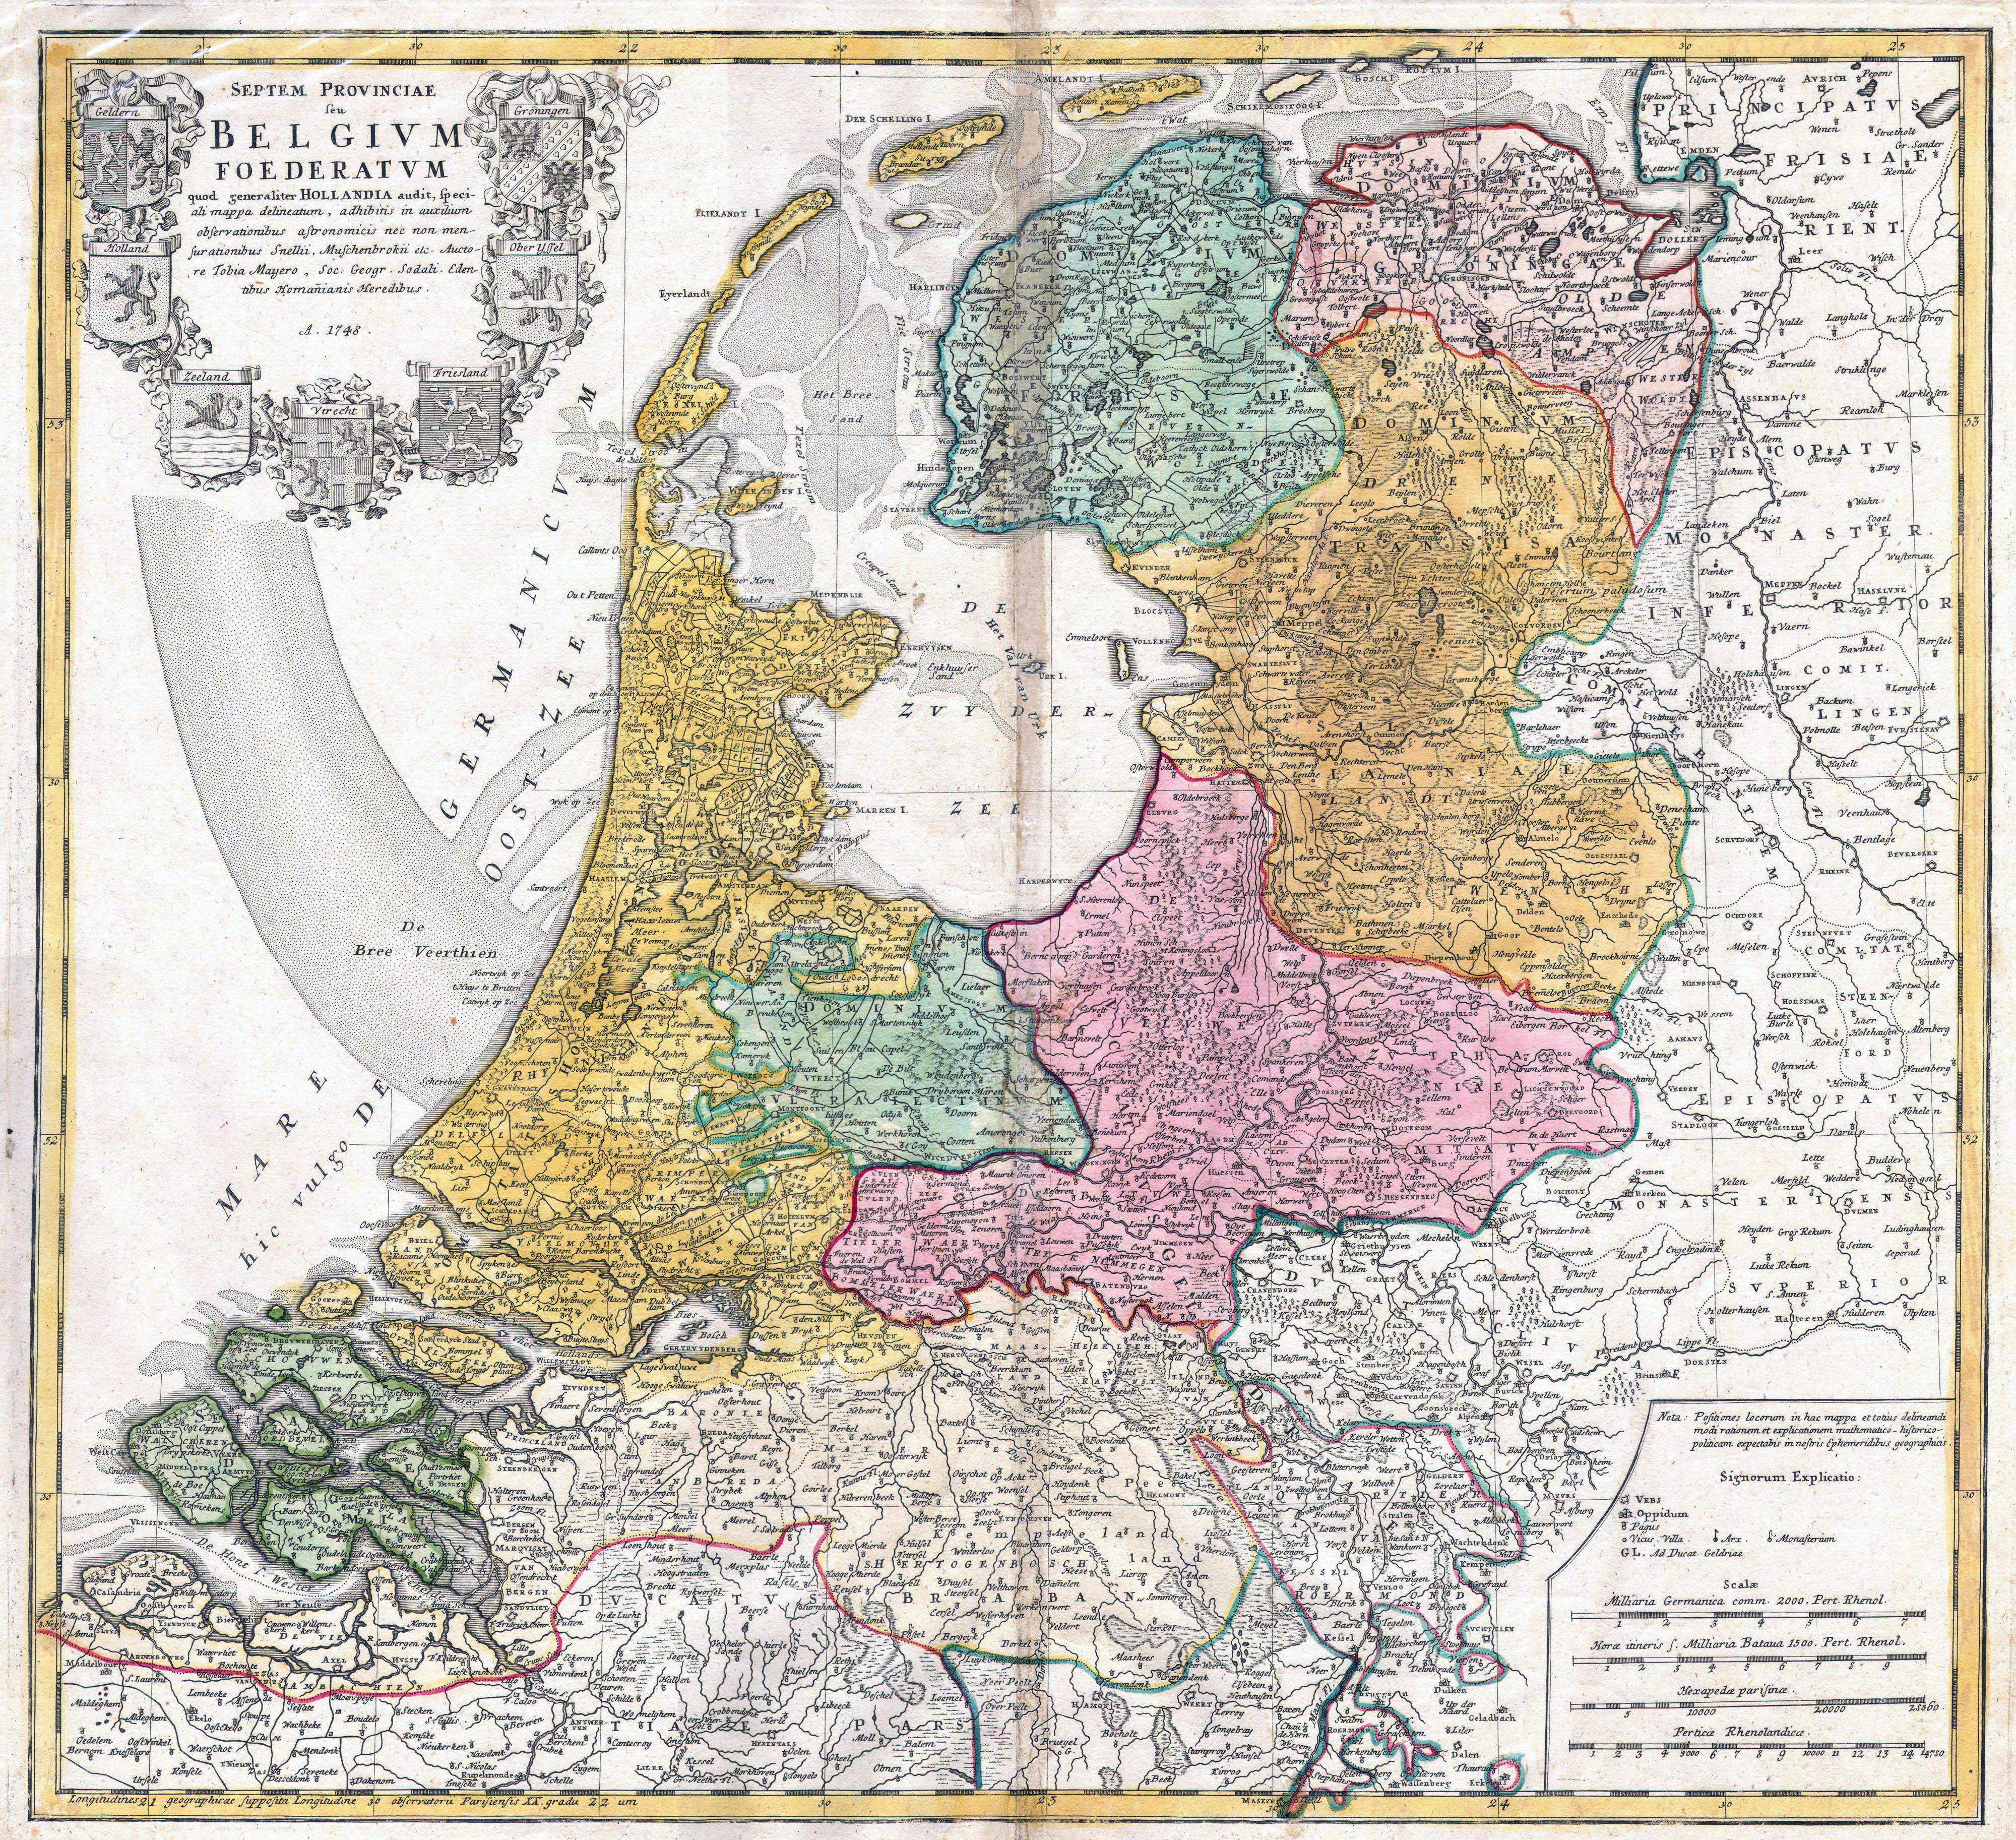 Large scale old map of Netherlands Holland 1748 Netherlands